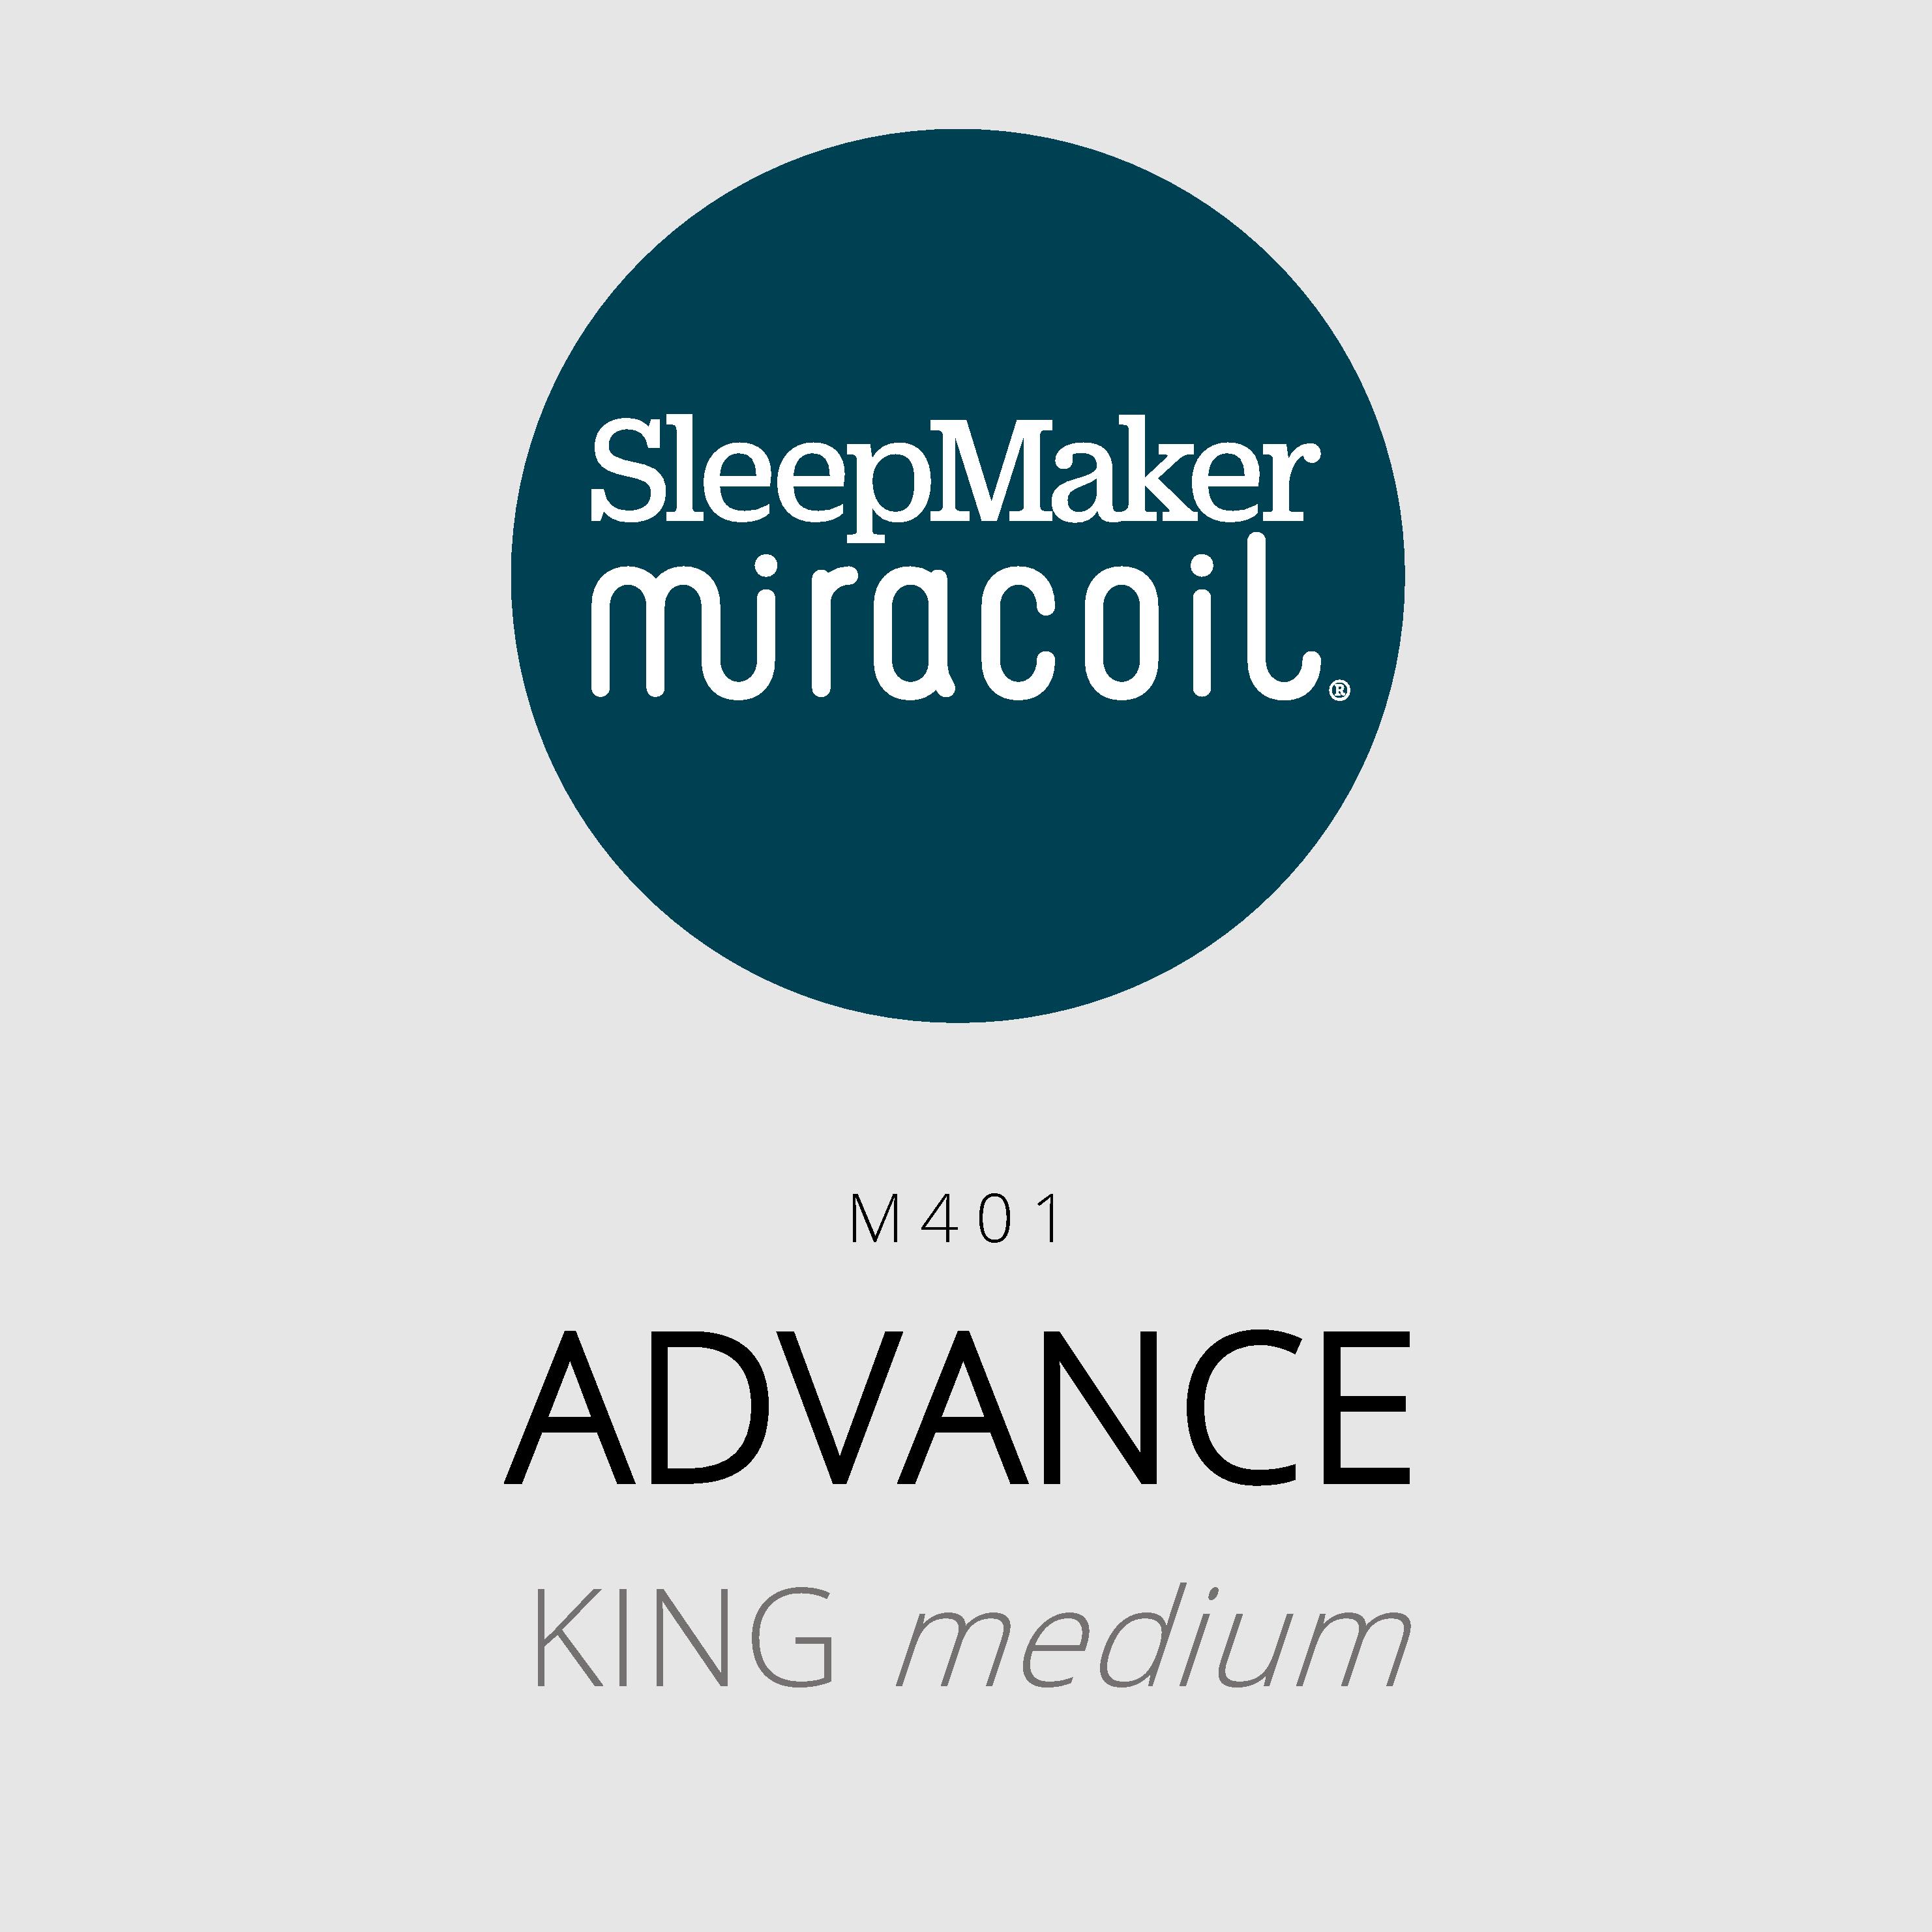 SleepMaker Miracoil – Advance – M401 – King Medium Mattress